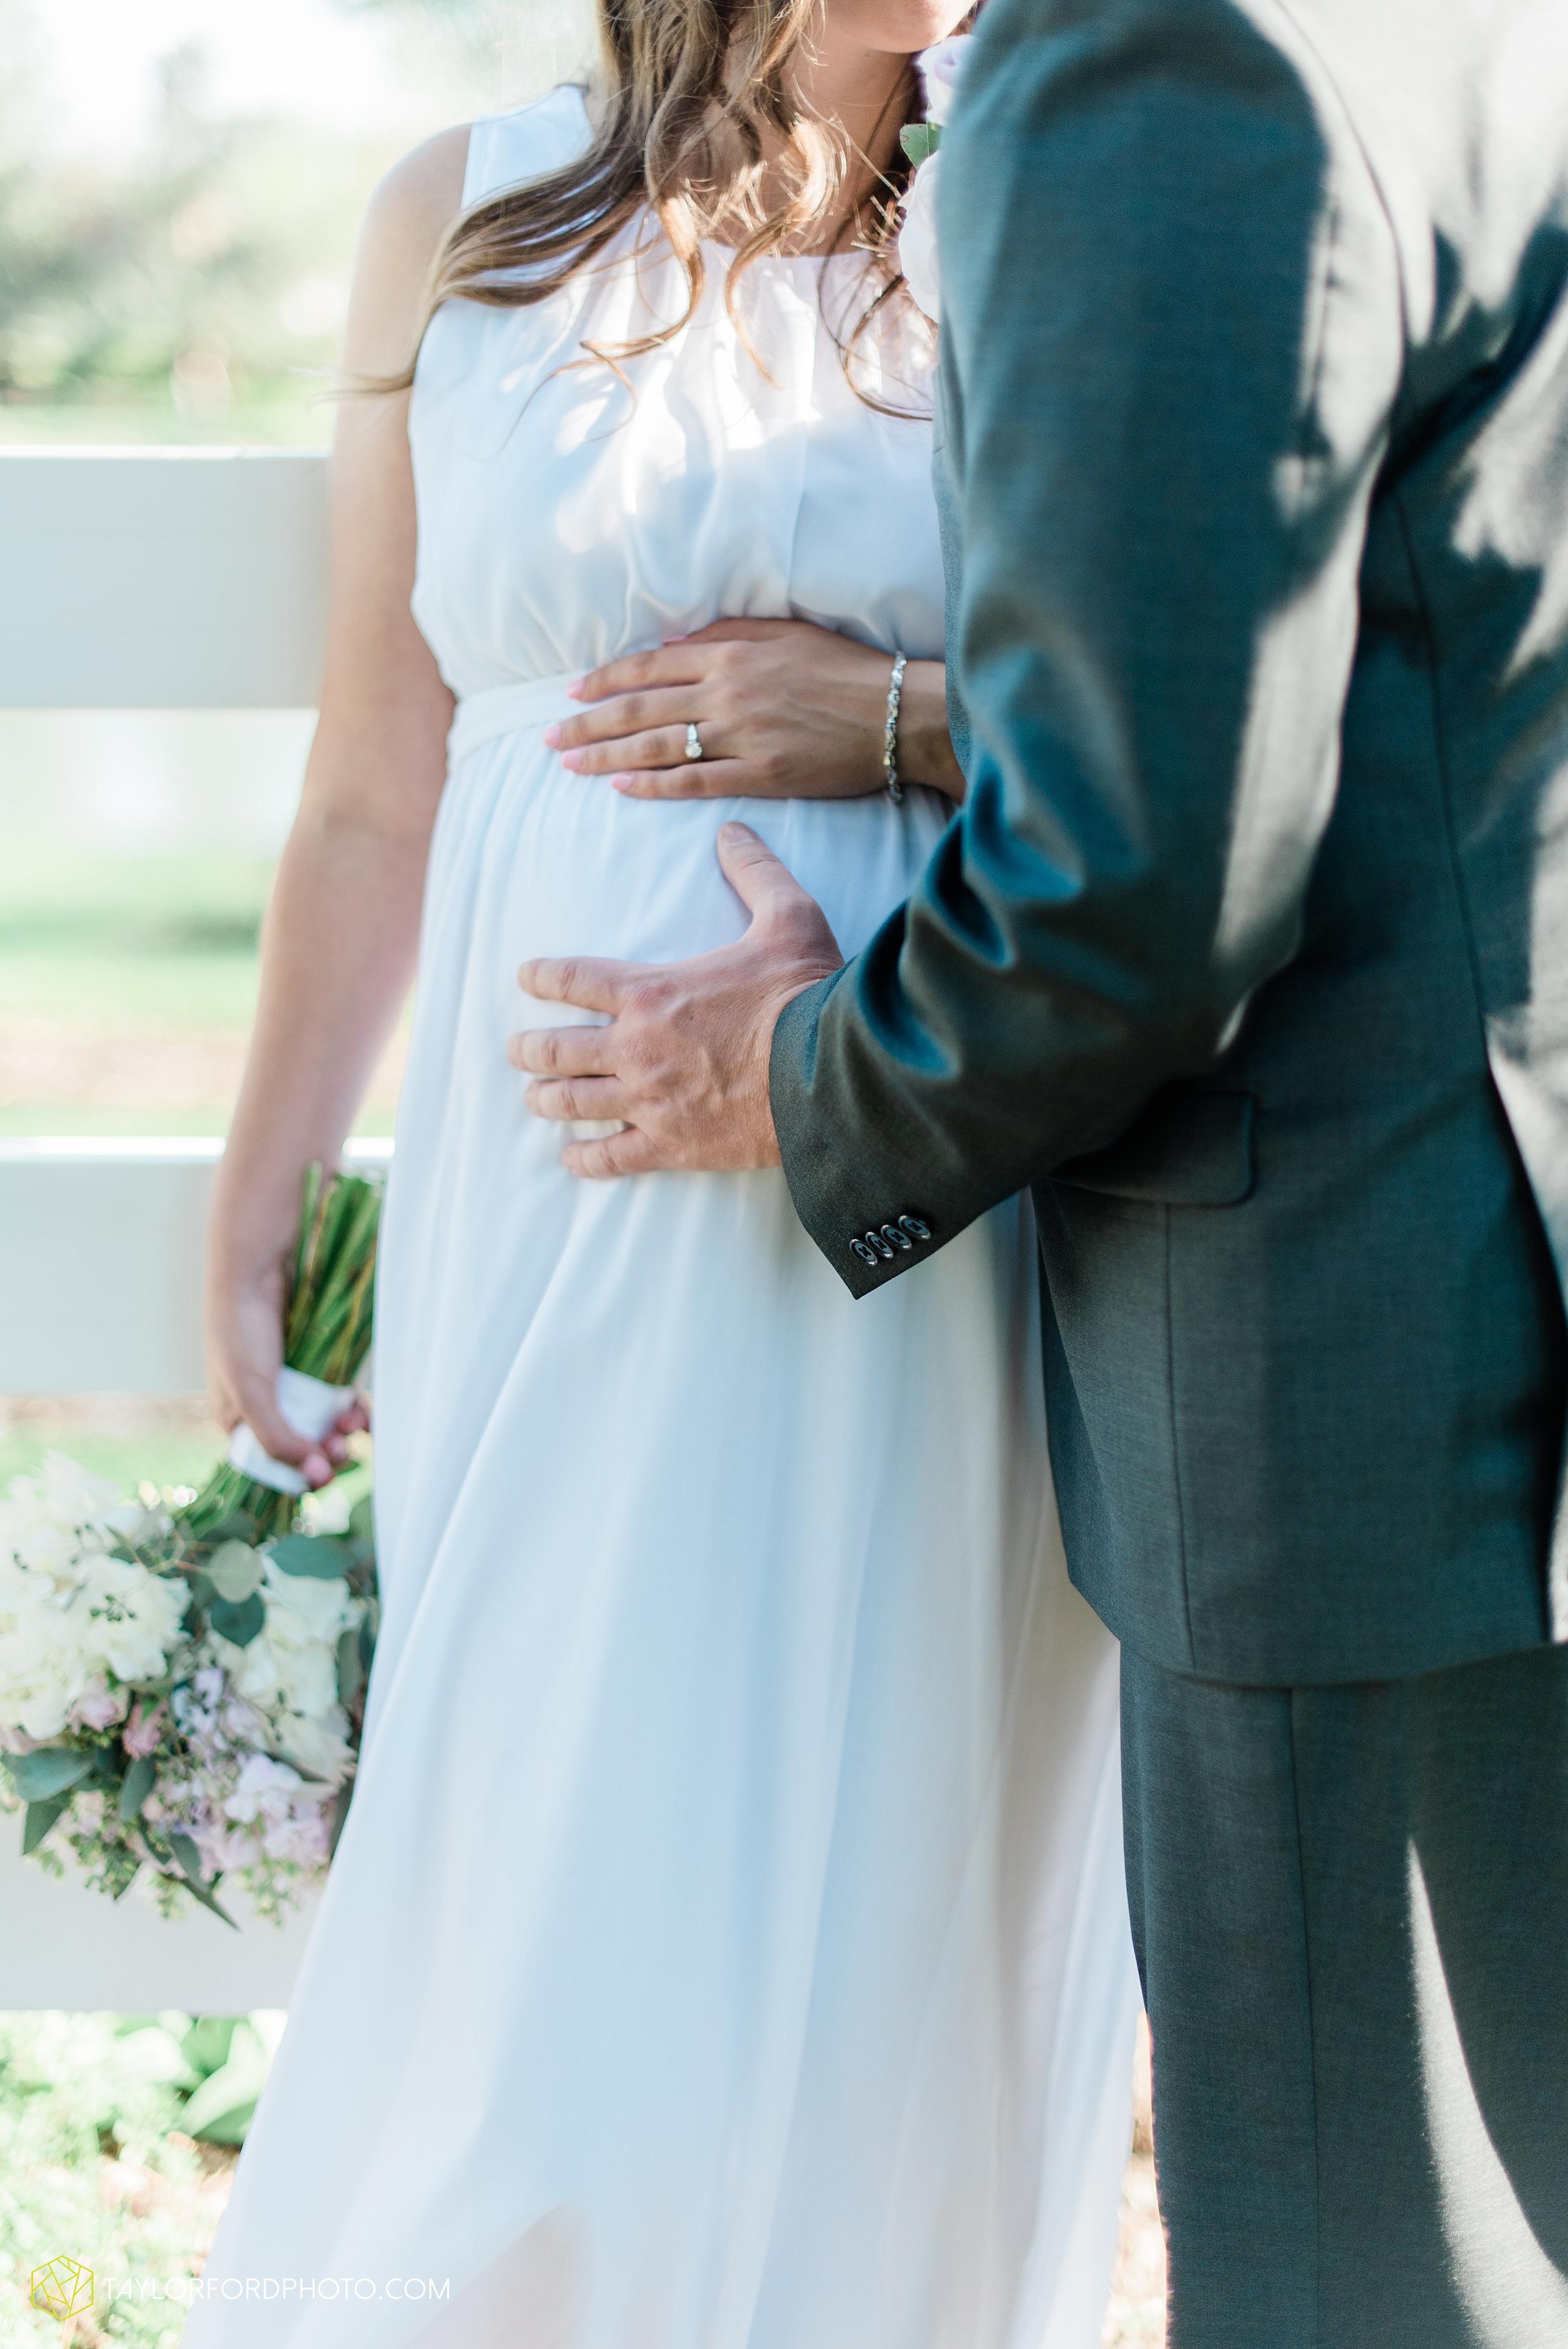 lakeside-rose-gardens-fort-wayne-indiana-elopement-wedding-photographer-Taylor-Ford-Photography_7180.jpg